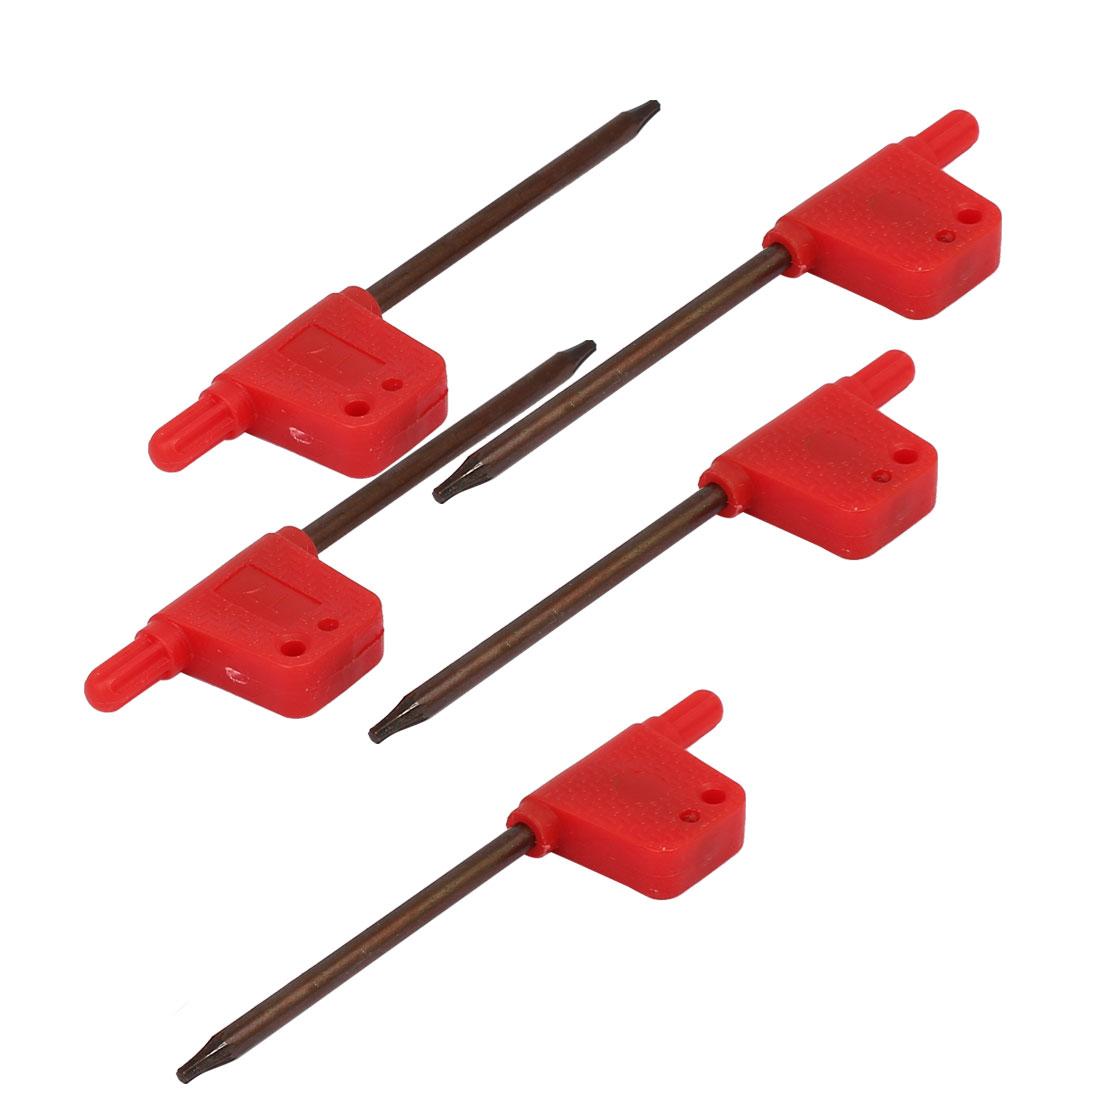 T7 S2 Plastic Nonslip Handle Flag Type Torx Wrench Spanner Repairing Tool 5pcs